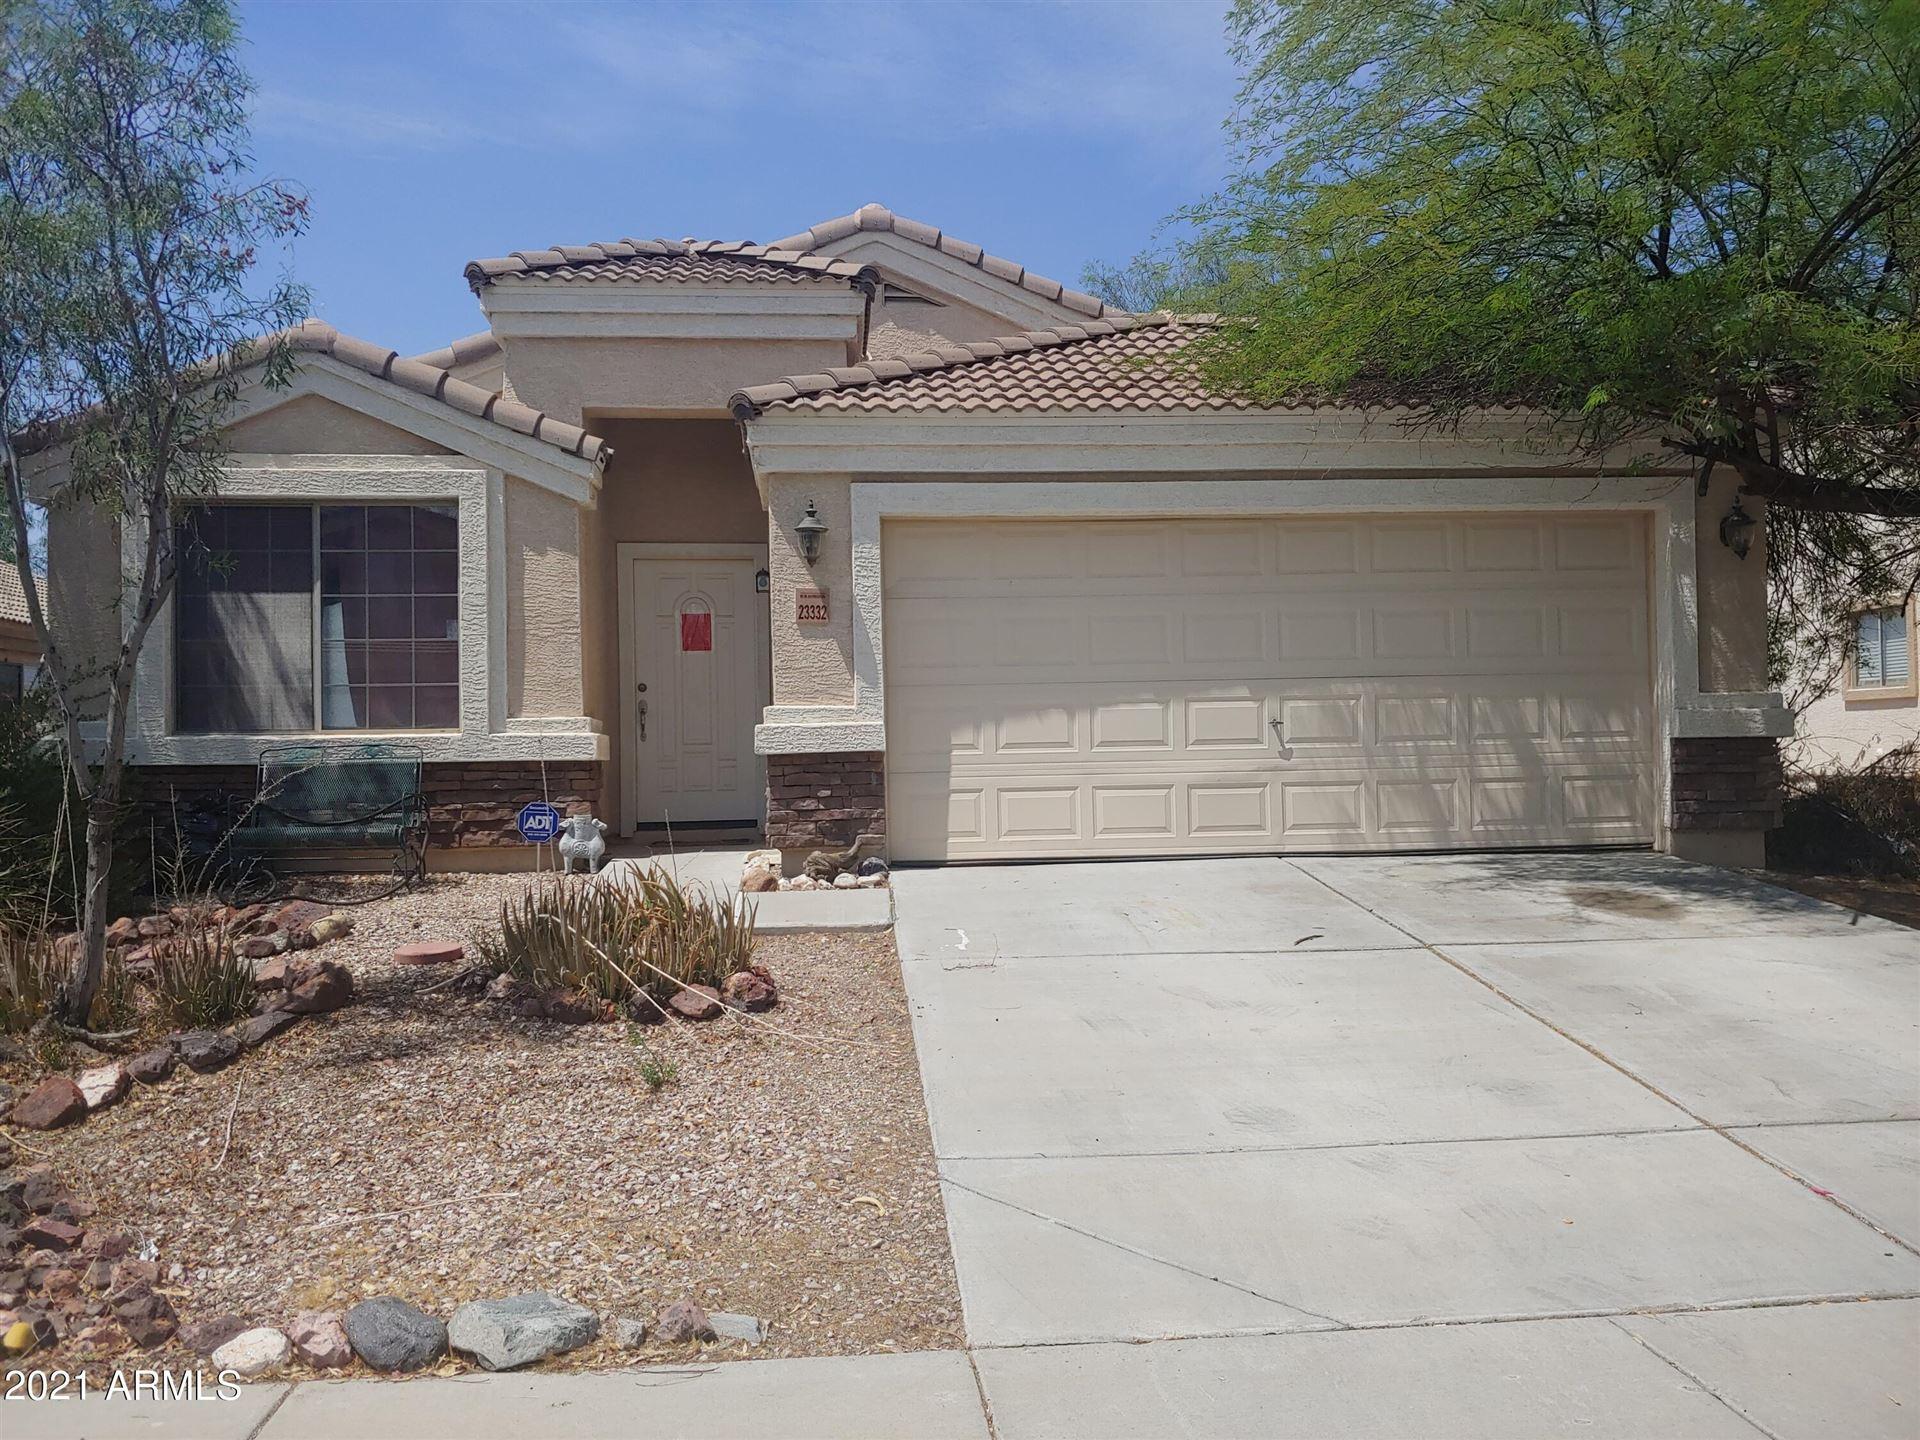 Photo of 23332 W ASHLEIGH MARIE Drive, Buckeye, AZ 85326 (MLS # 6267773)